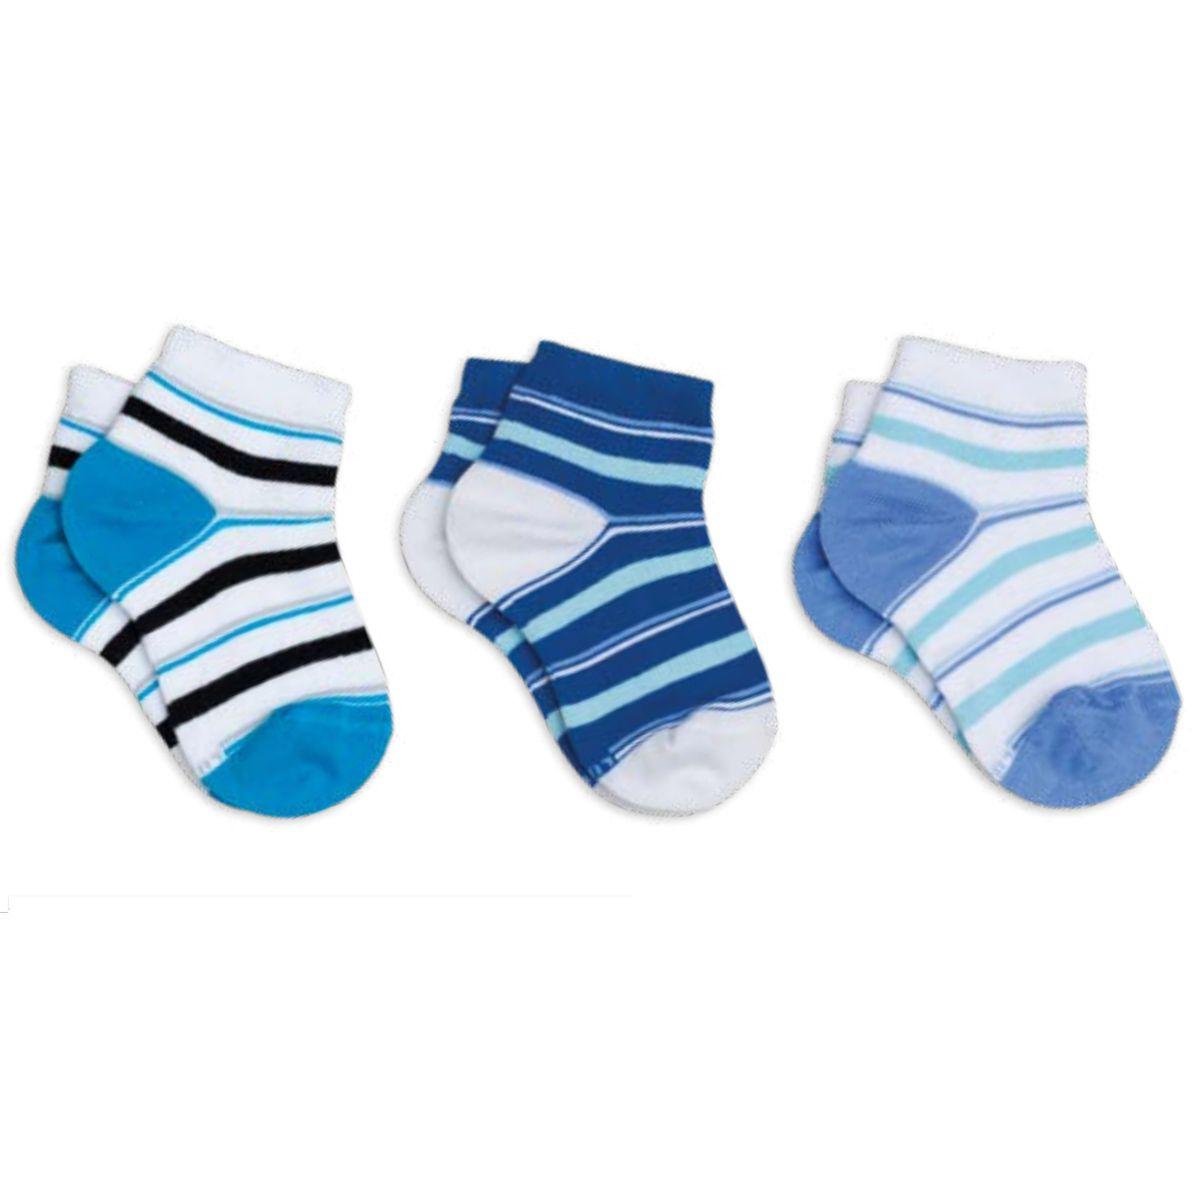 Kit 6 meias Lupo infantil masculina cano curto .